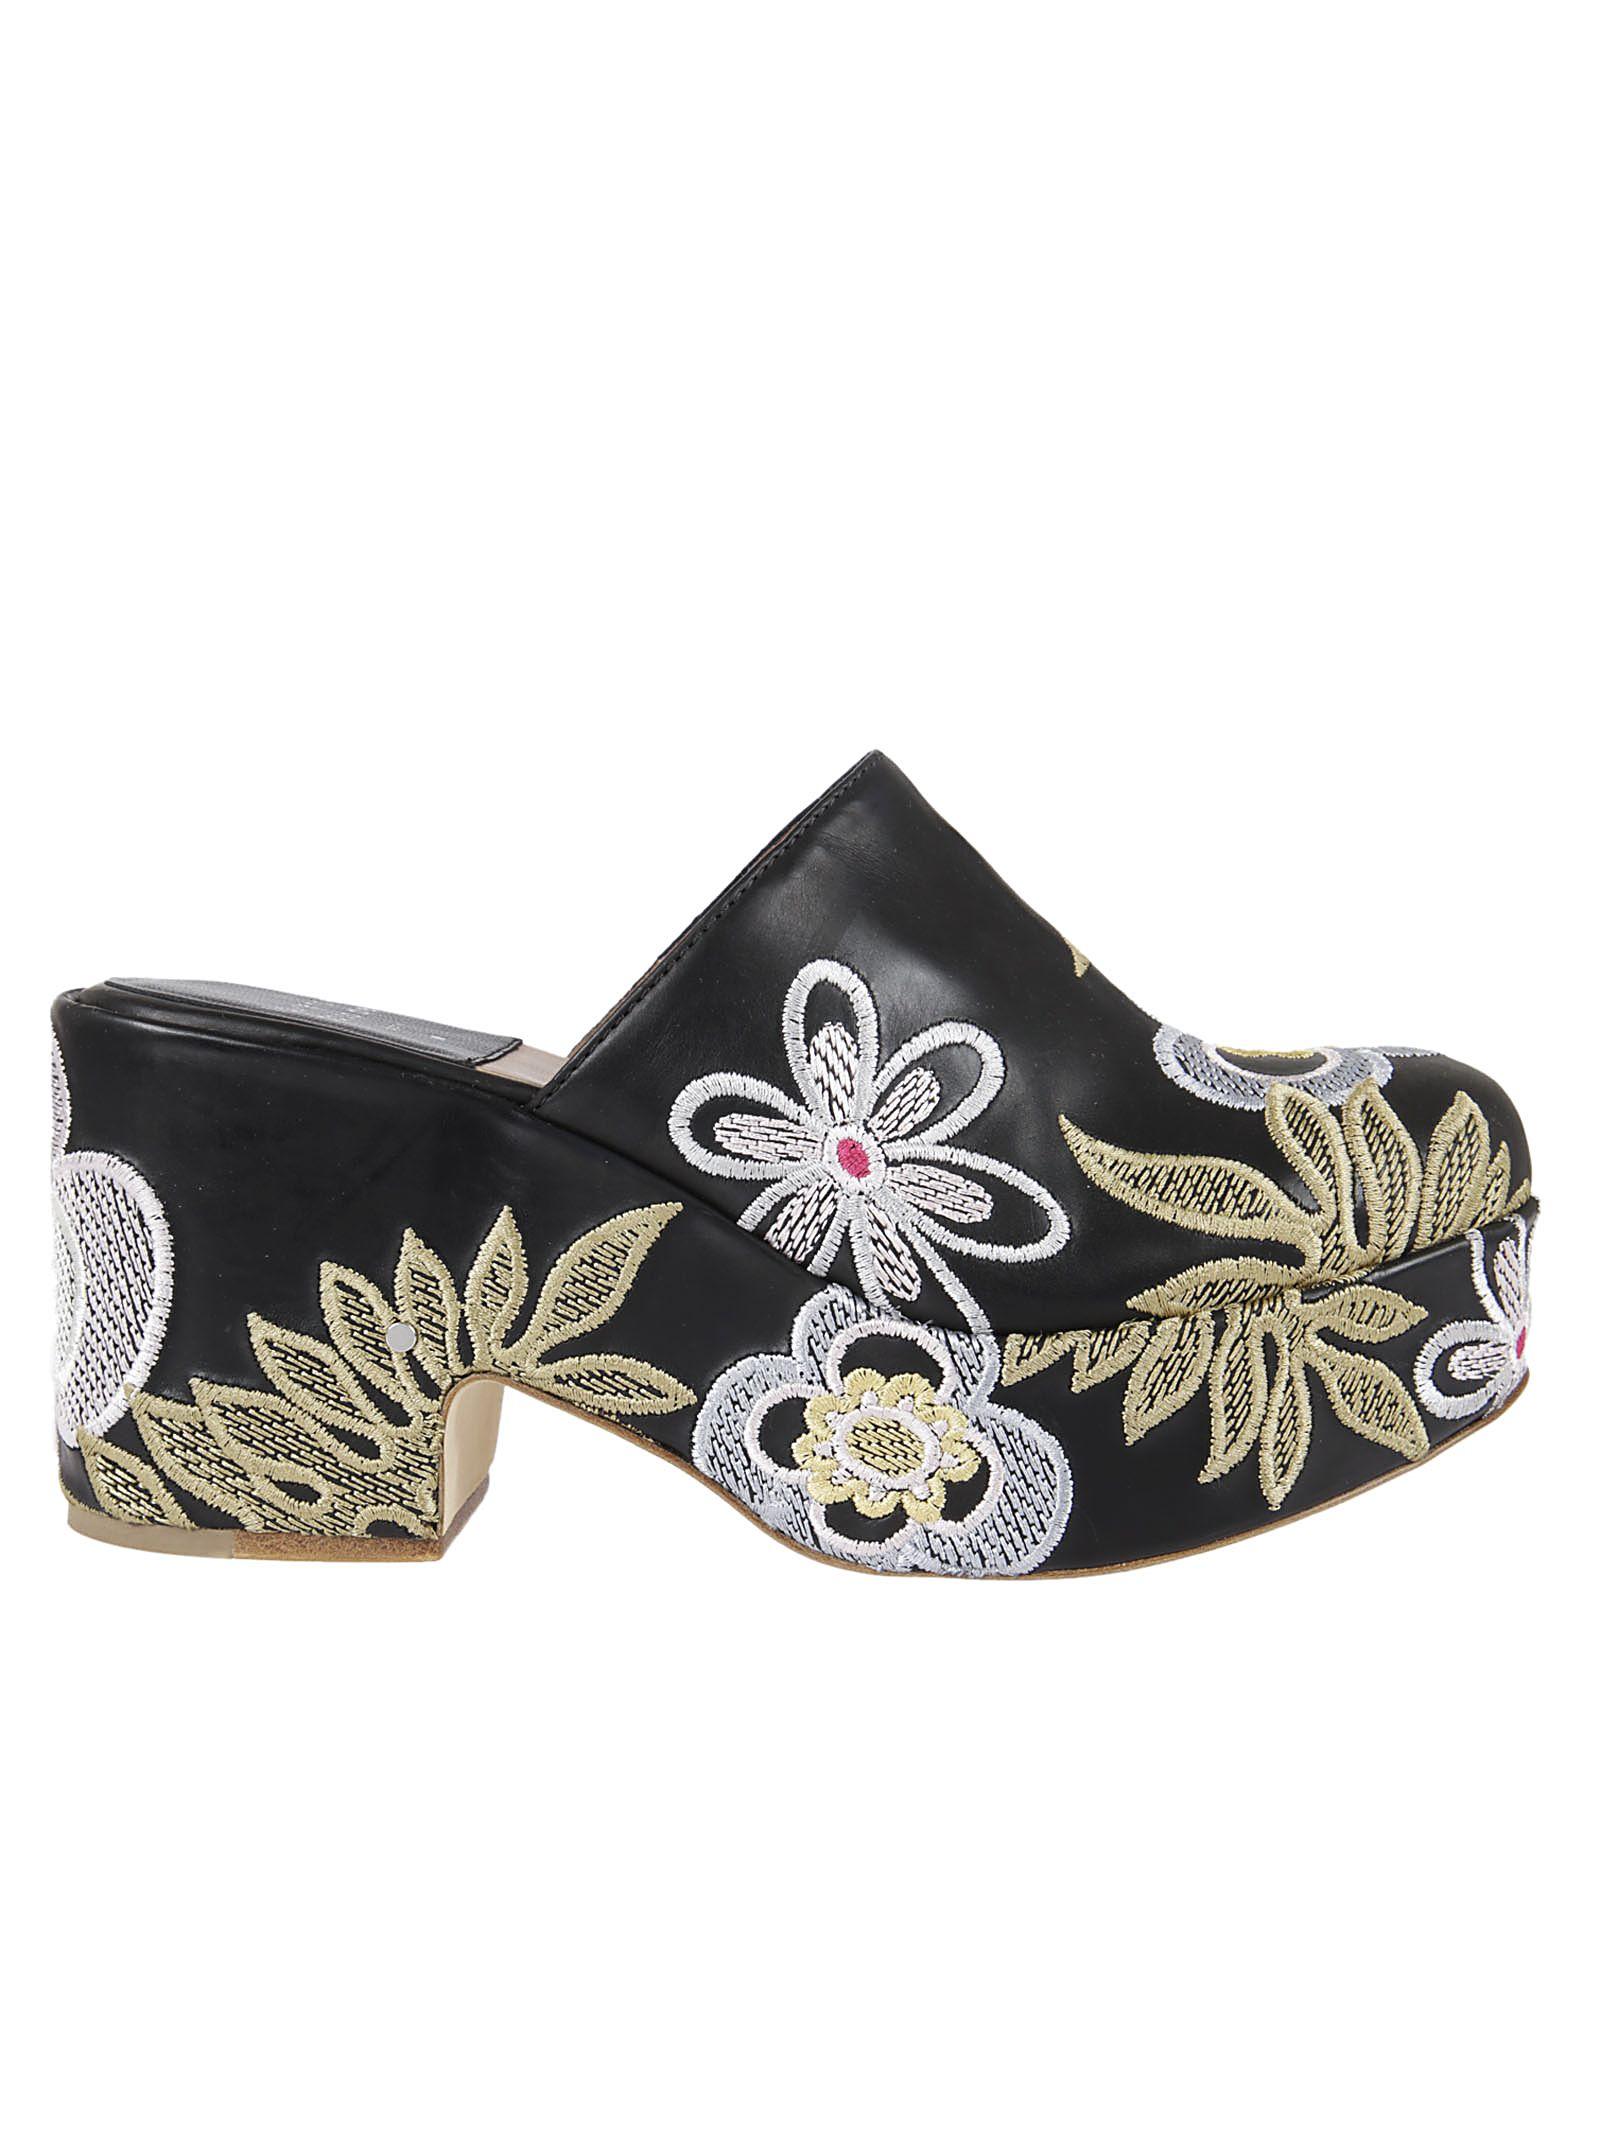 Laurence Dacade Nanouk Sandals